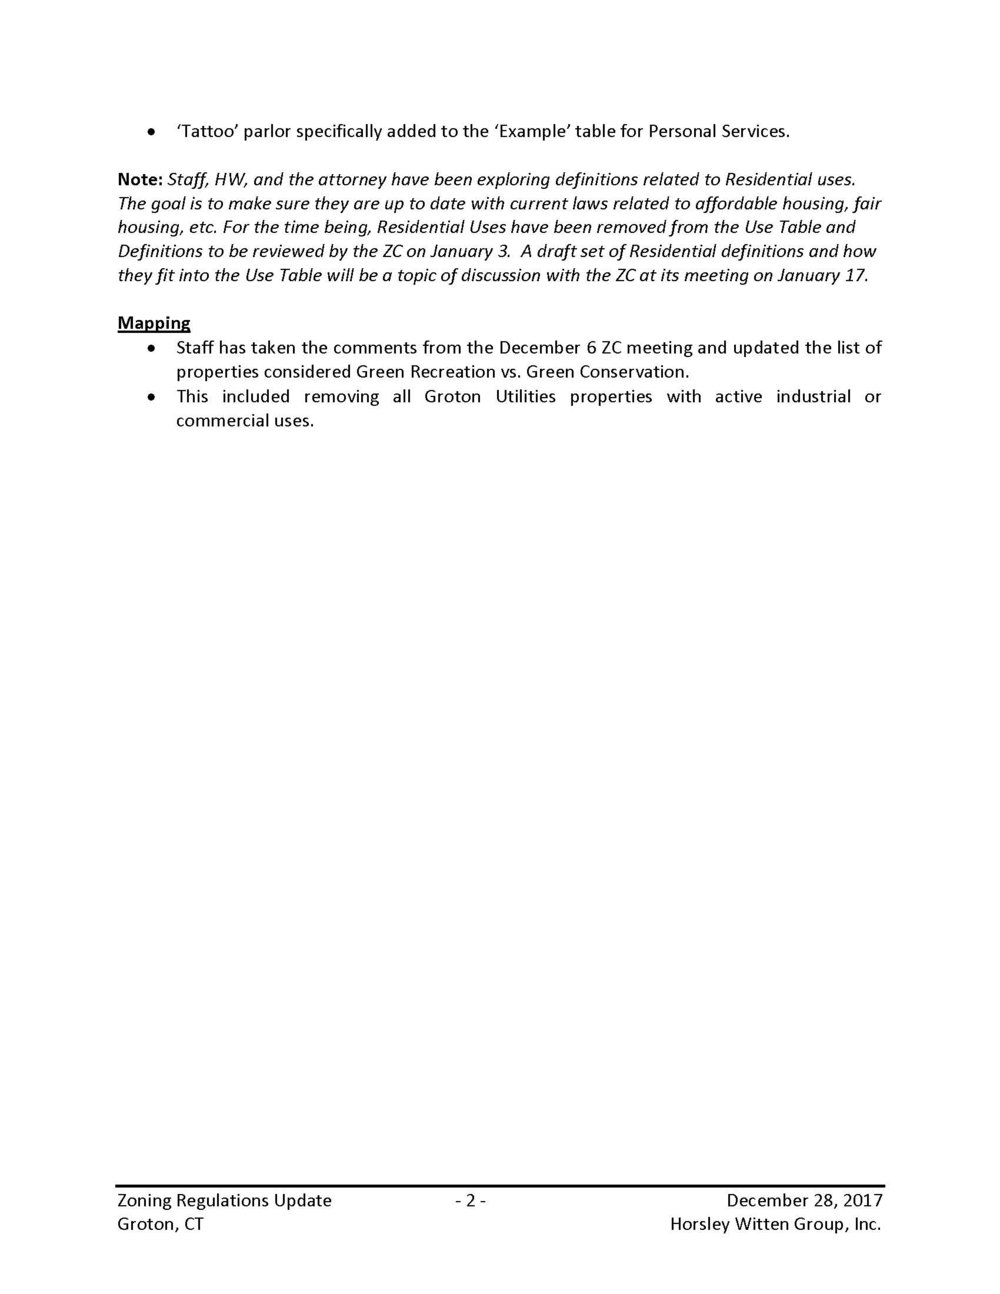 171228_ZCMtg_Memo_16156_Page_2.jpg